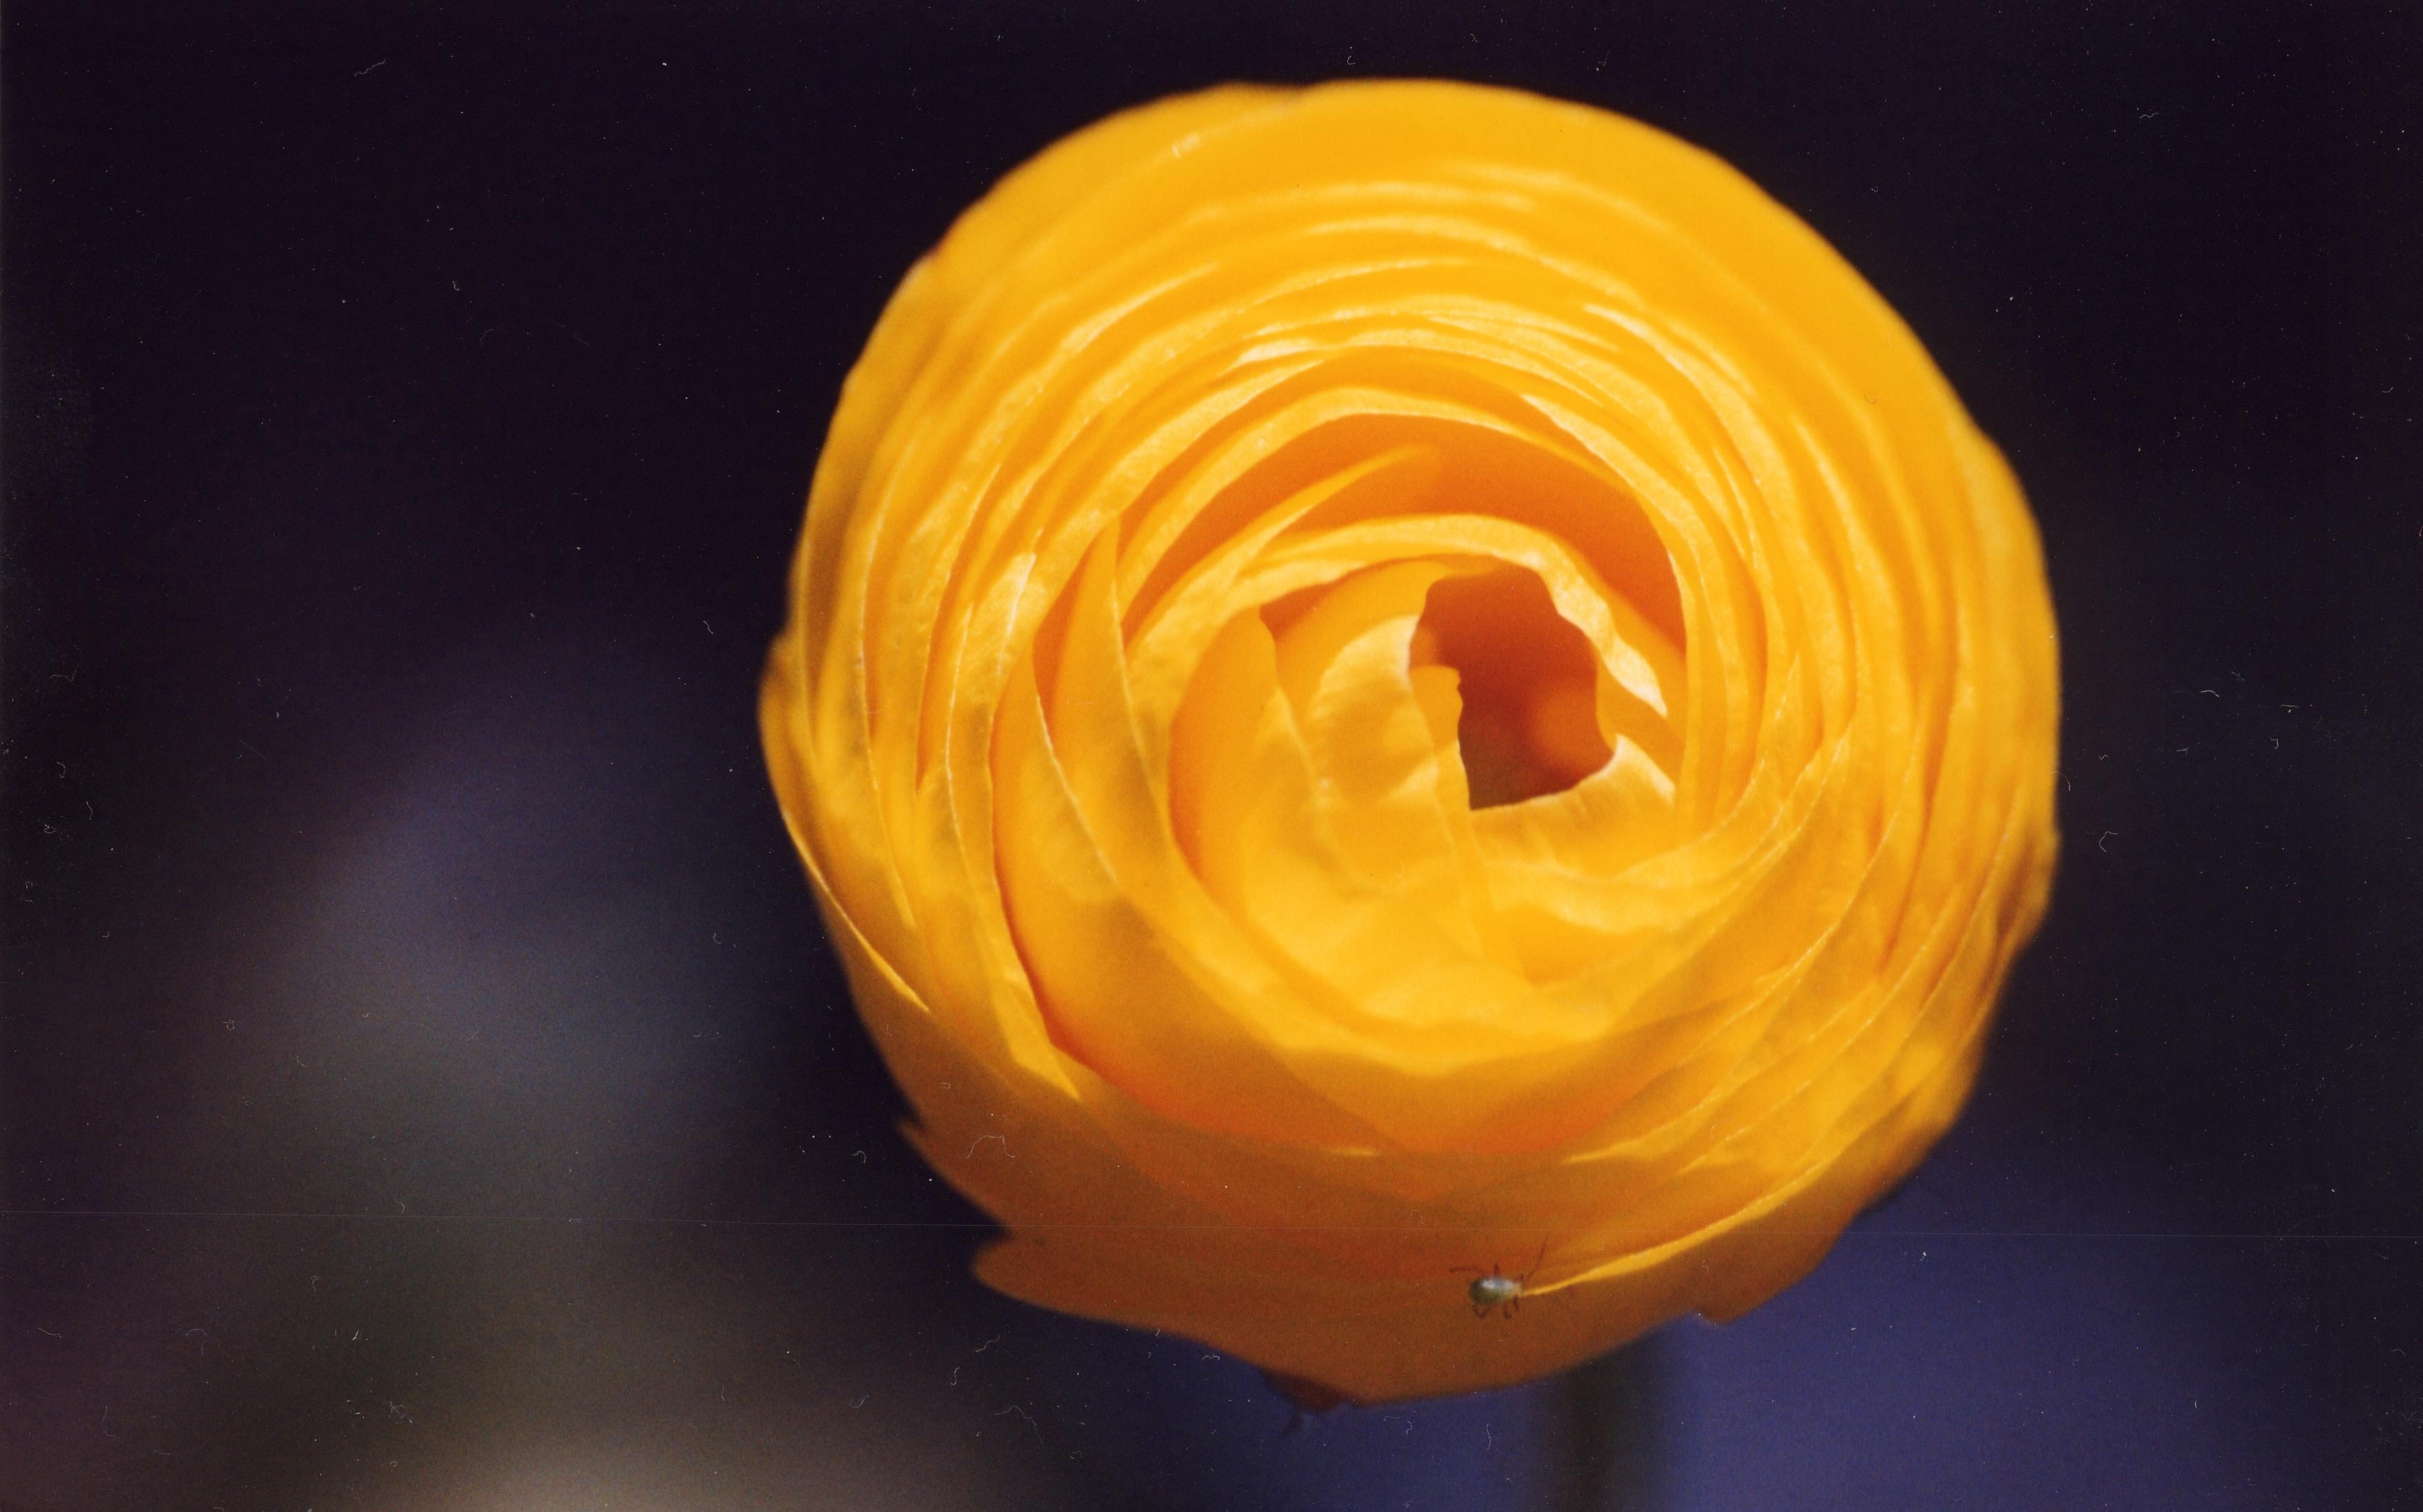 File:Heart of gold.JPG - Wikipedia, the free encyclopedia